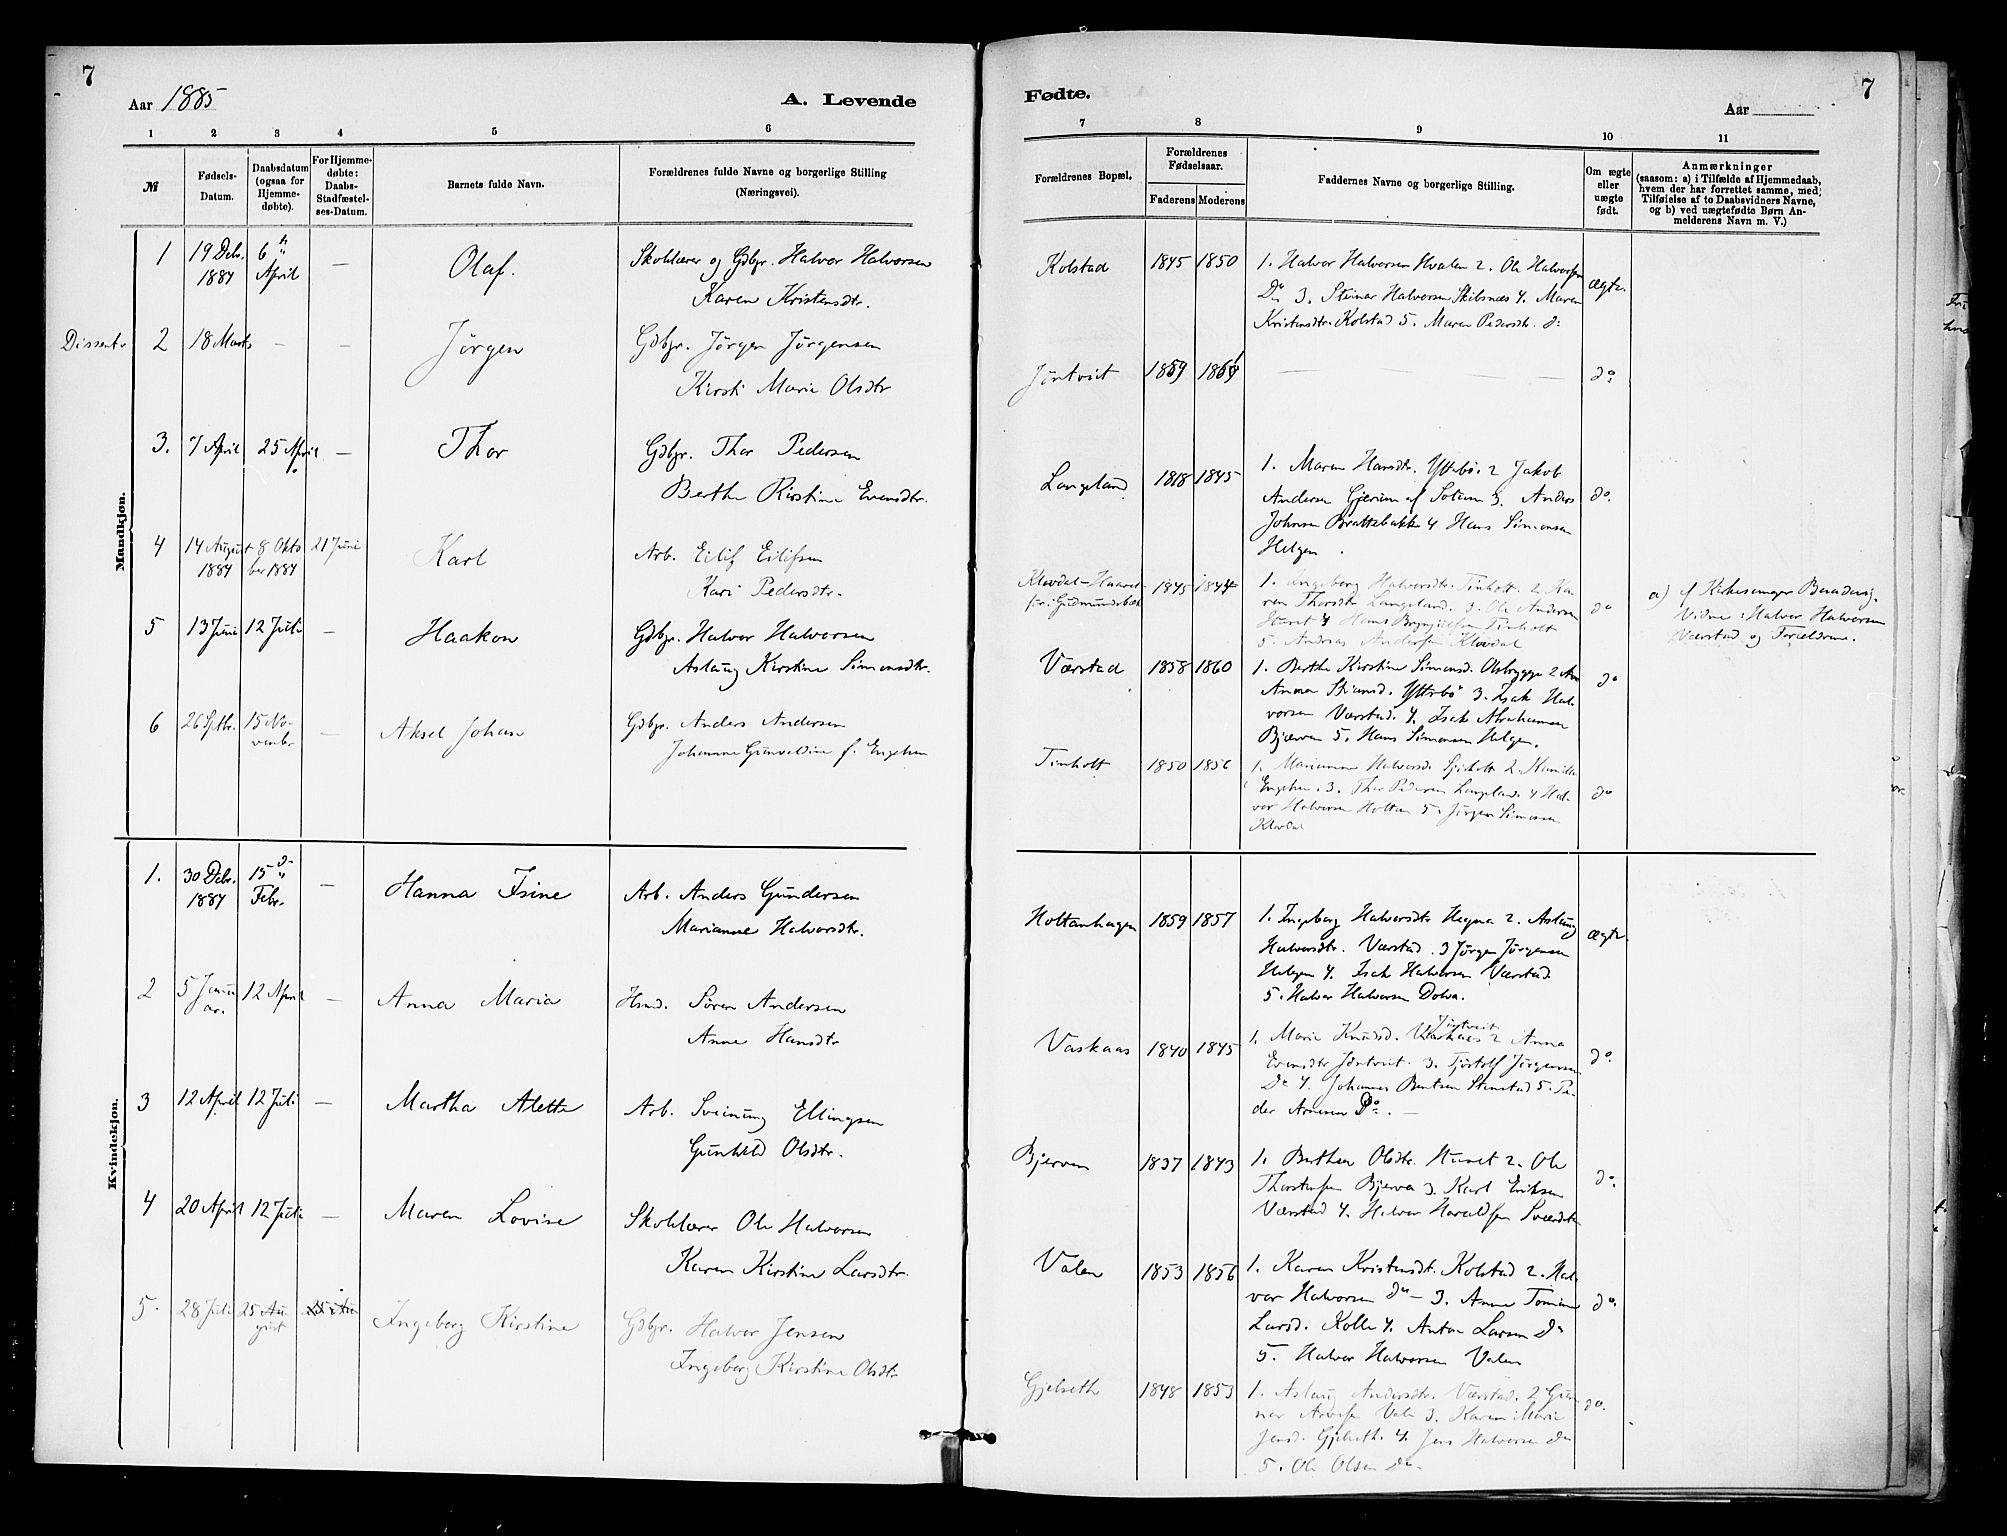 SAKO, Holla kirkebøker, F/Fa/L0009: Ministerialbok nr. 9, 1881-1897, s. 7